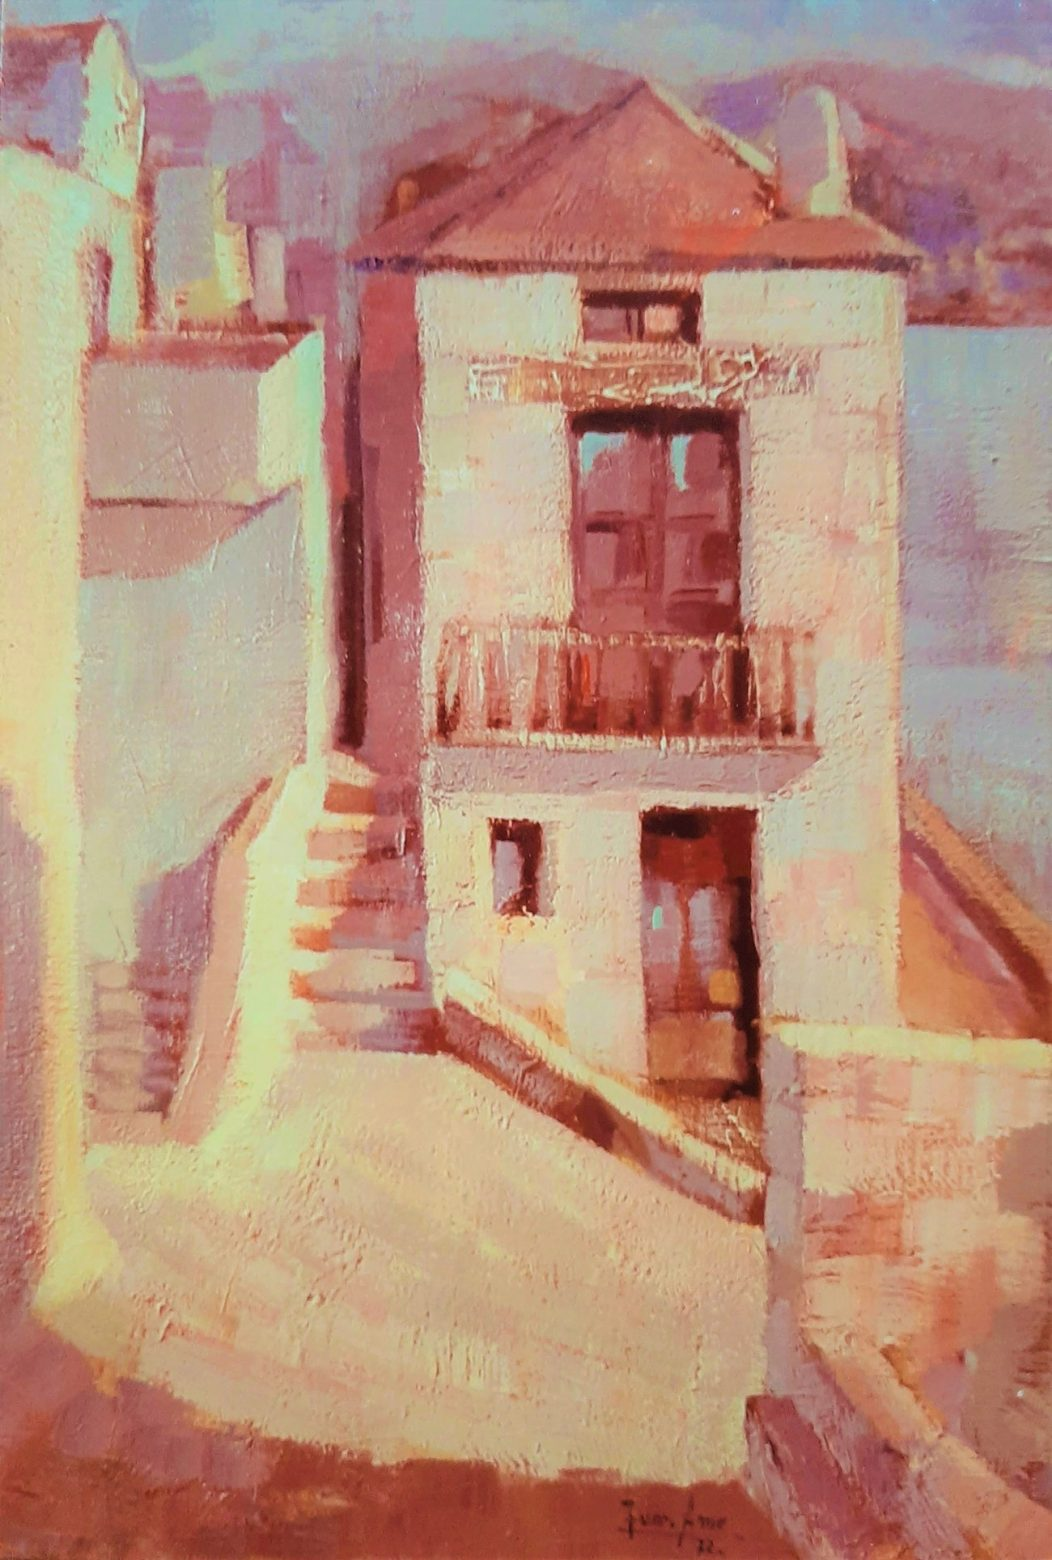 Juan Amo. (1972). Altea. Óleo - Lienzo. Colección Privada.